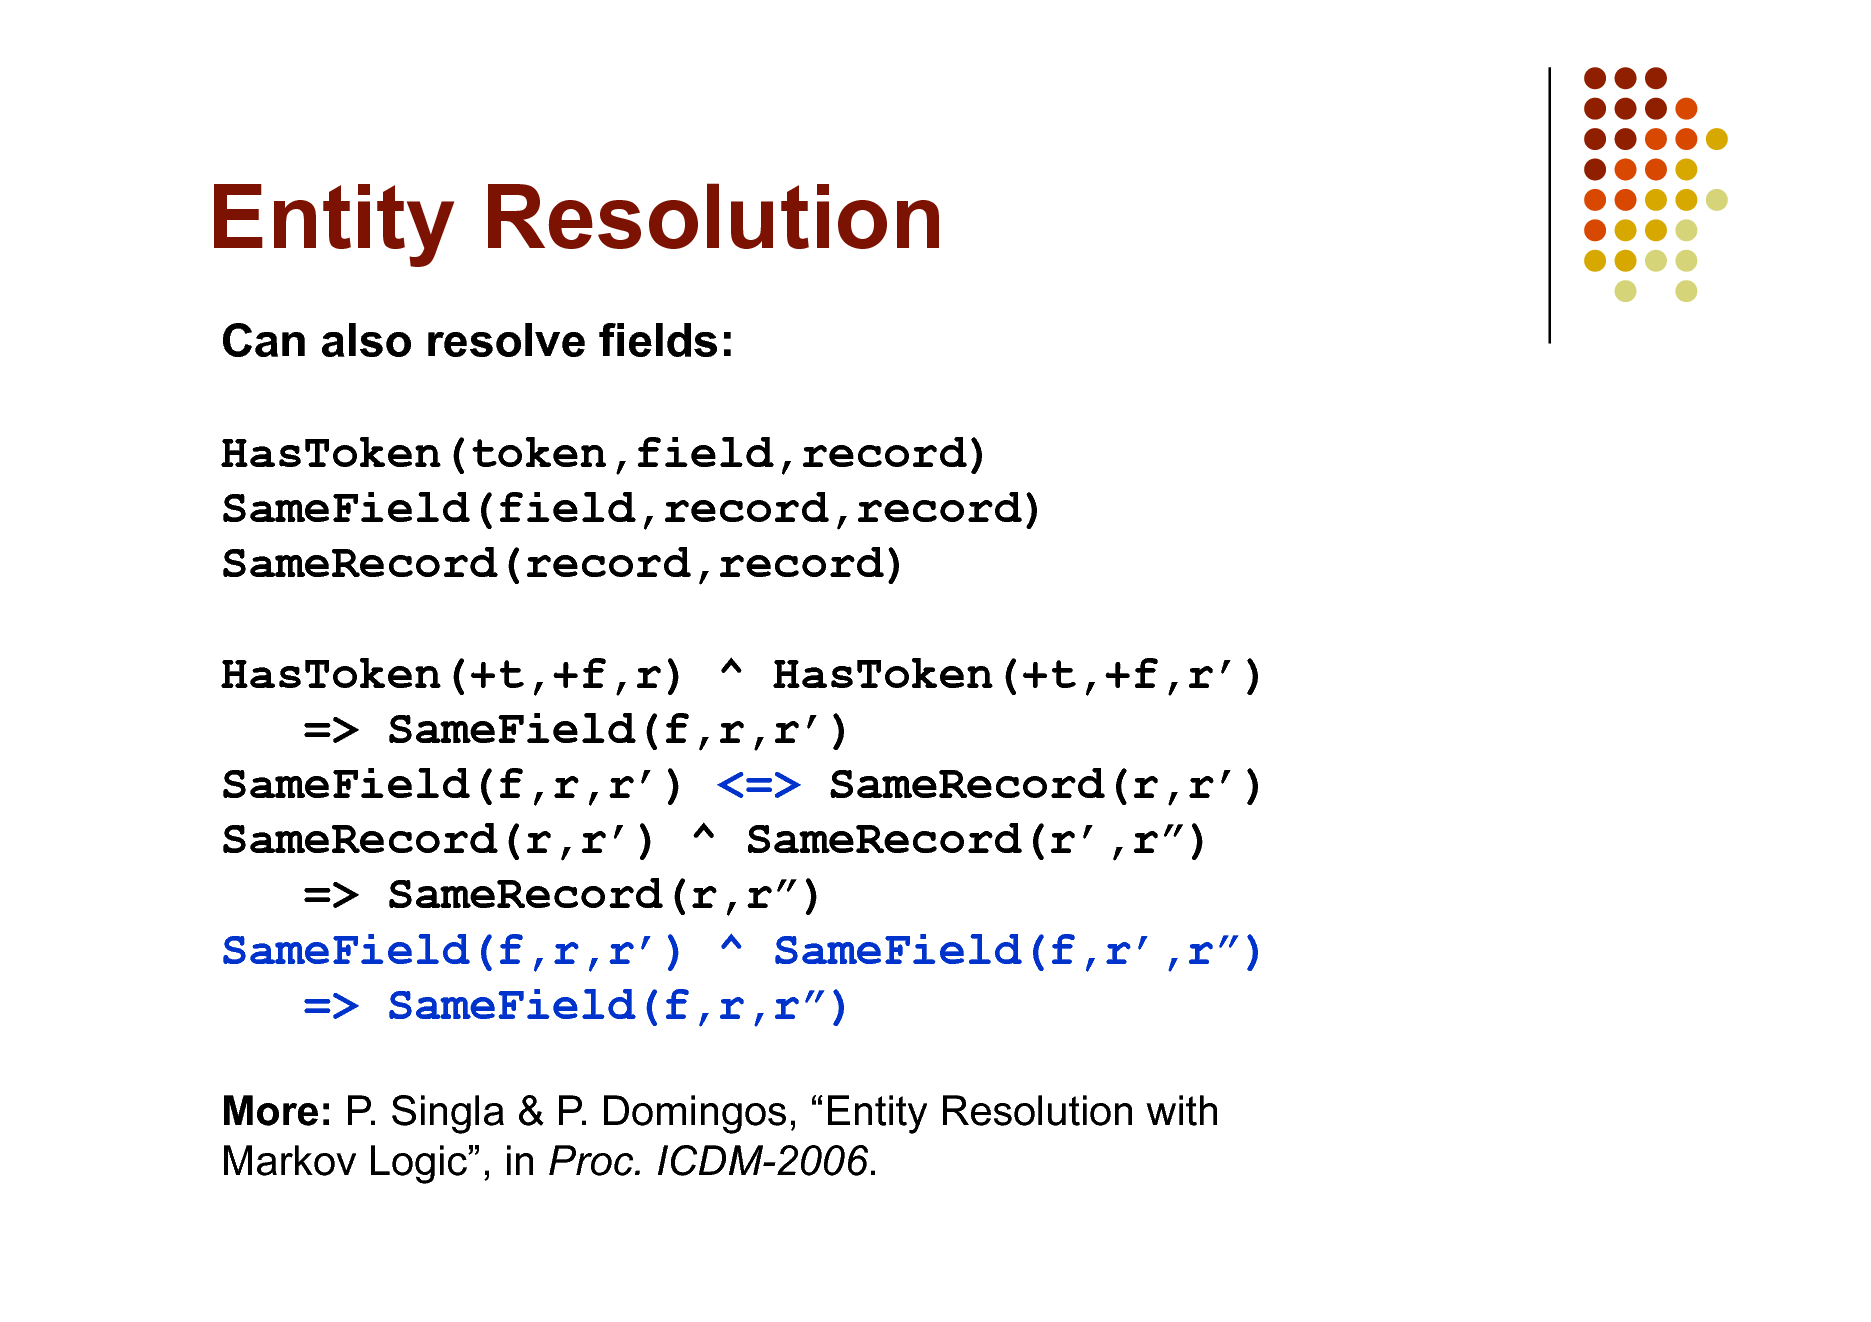 Slide: Entity Resolution Can also resolve fields: HasToken(token,field,record) SameField(field,record,record) SameRecord(record,record) HasToken(+t,+f,r) ^ HasToken(+t,+f,r) => SameField(f,r,r) SameField(f,r,r) <=> SameRecord(r,r) SameRecord(r,r) ^ SameRecord(r,r) => SameRecord(r,r) SameField(f,r,r) ^ SameField(f,r,r) => SameField(f,r,r) More: P. Singla & P. Domingos, Entity Resolution with Markov Logic, in Proc. ICDM-2006.